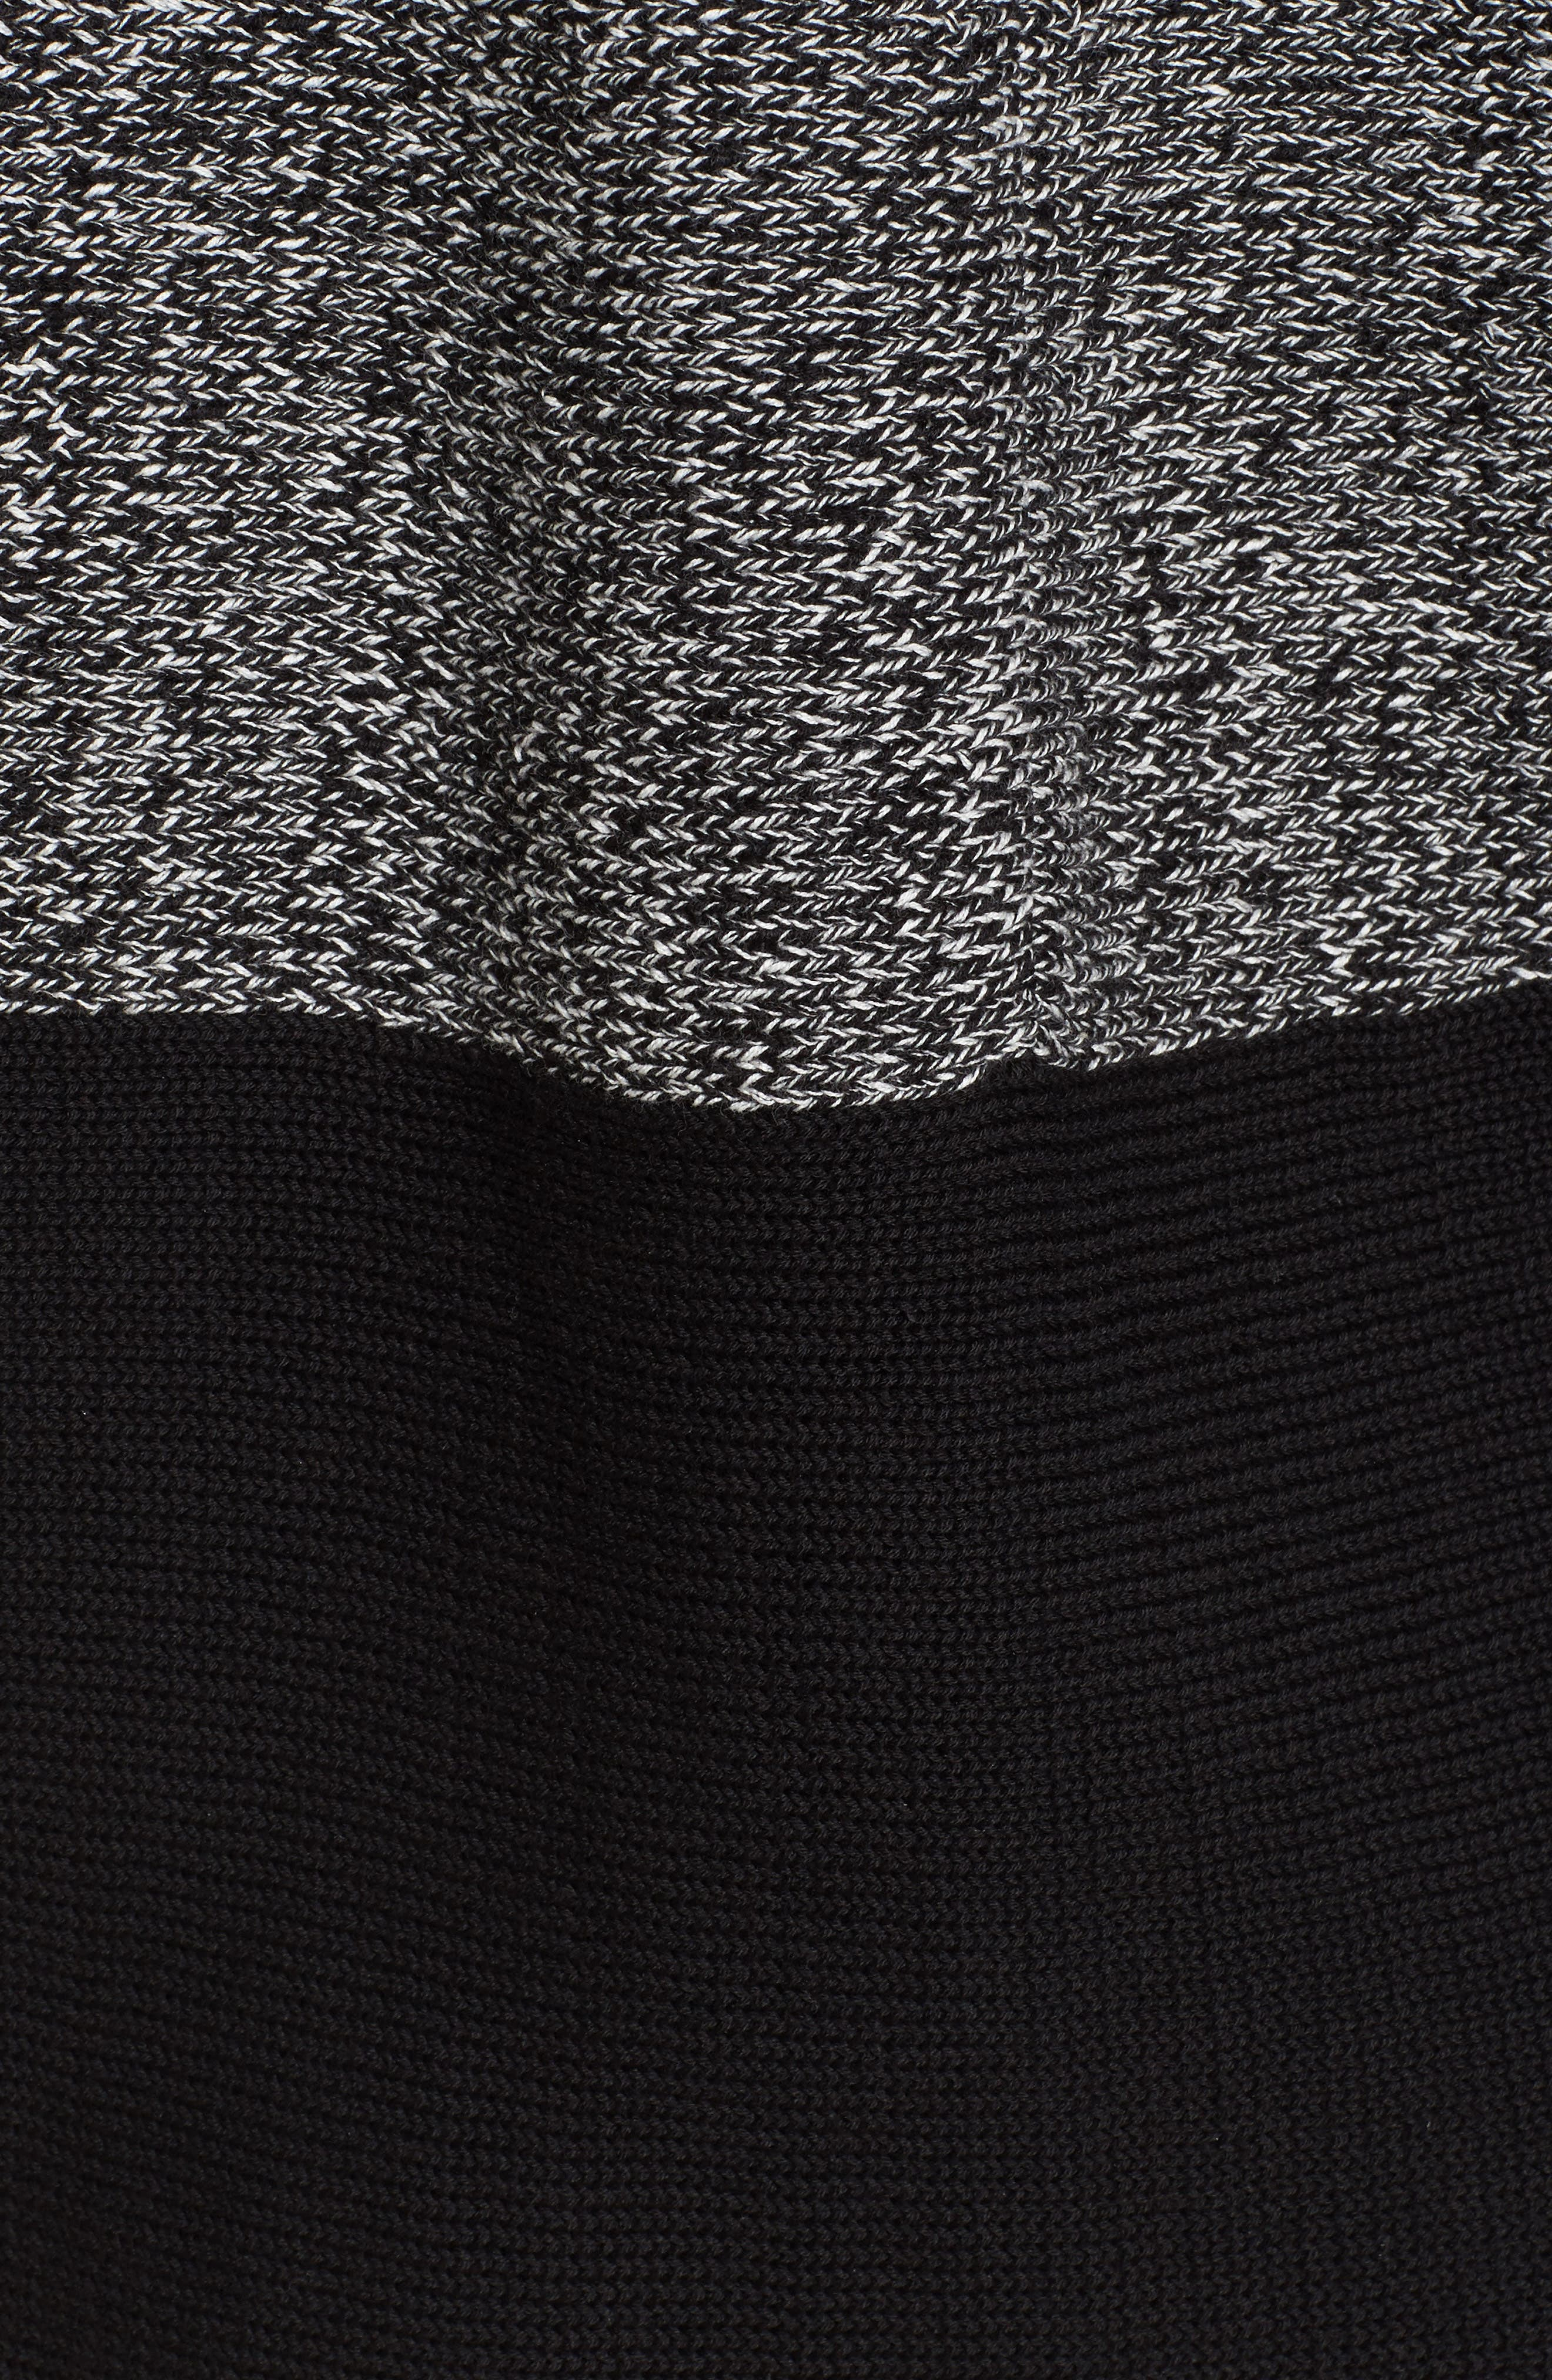 CHAUS,                             Colorblock Kimono Sleeve Sweater,                             Alternate thumbnail 5, color,                             006